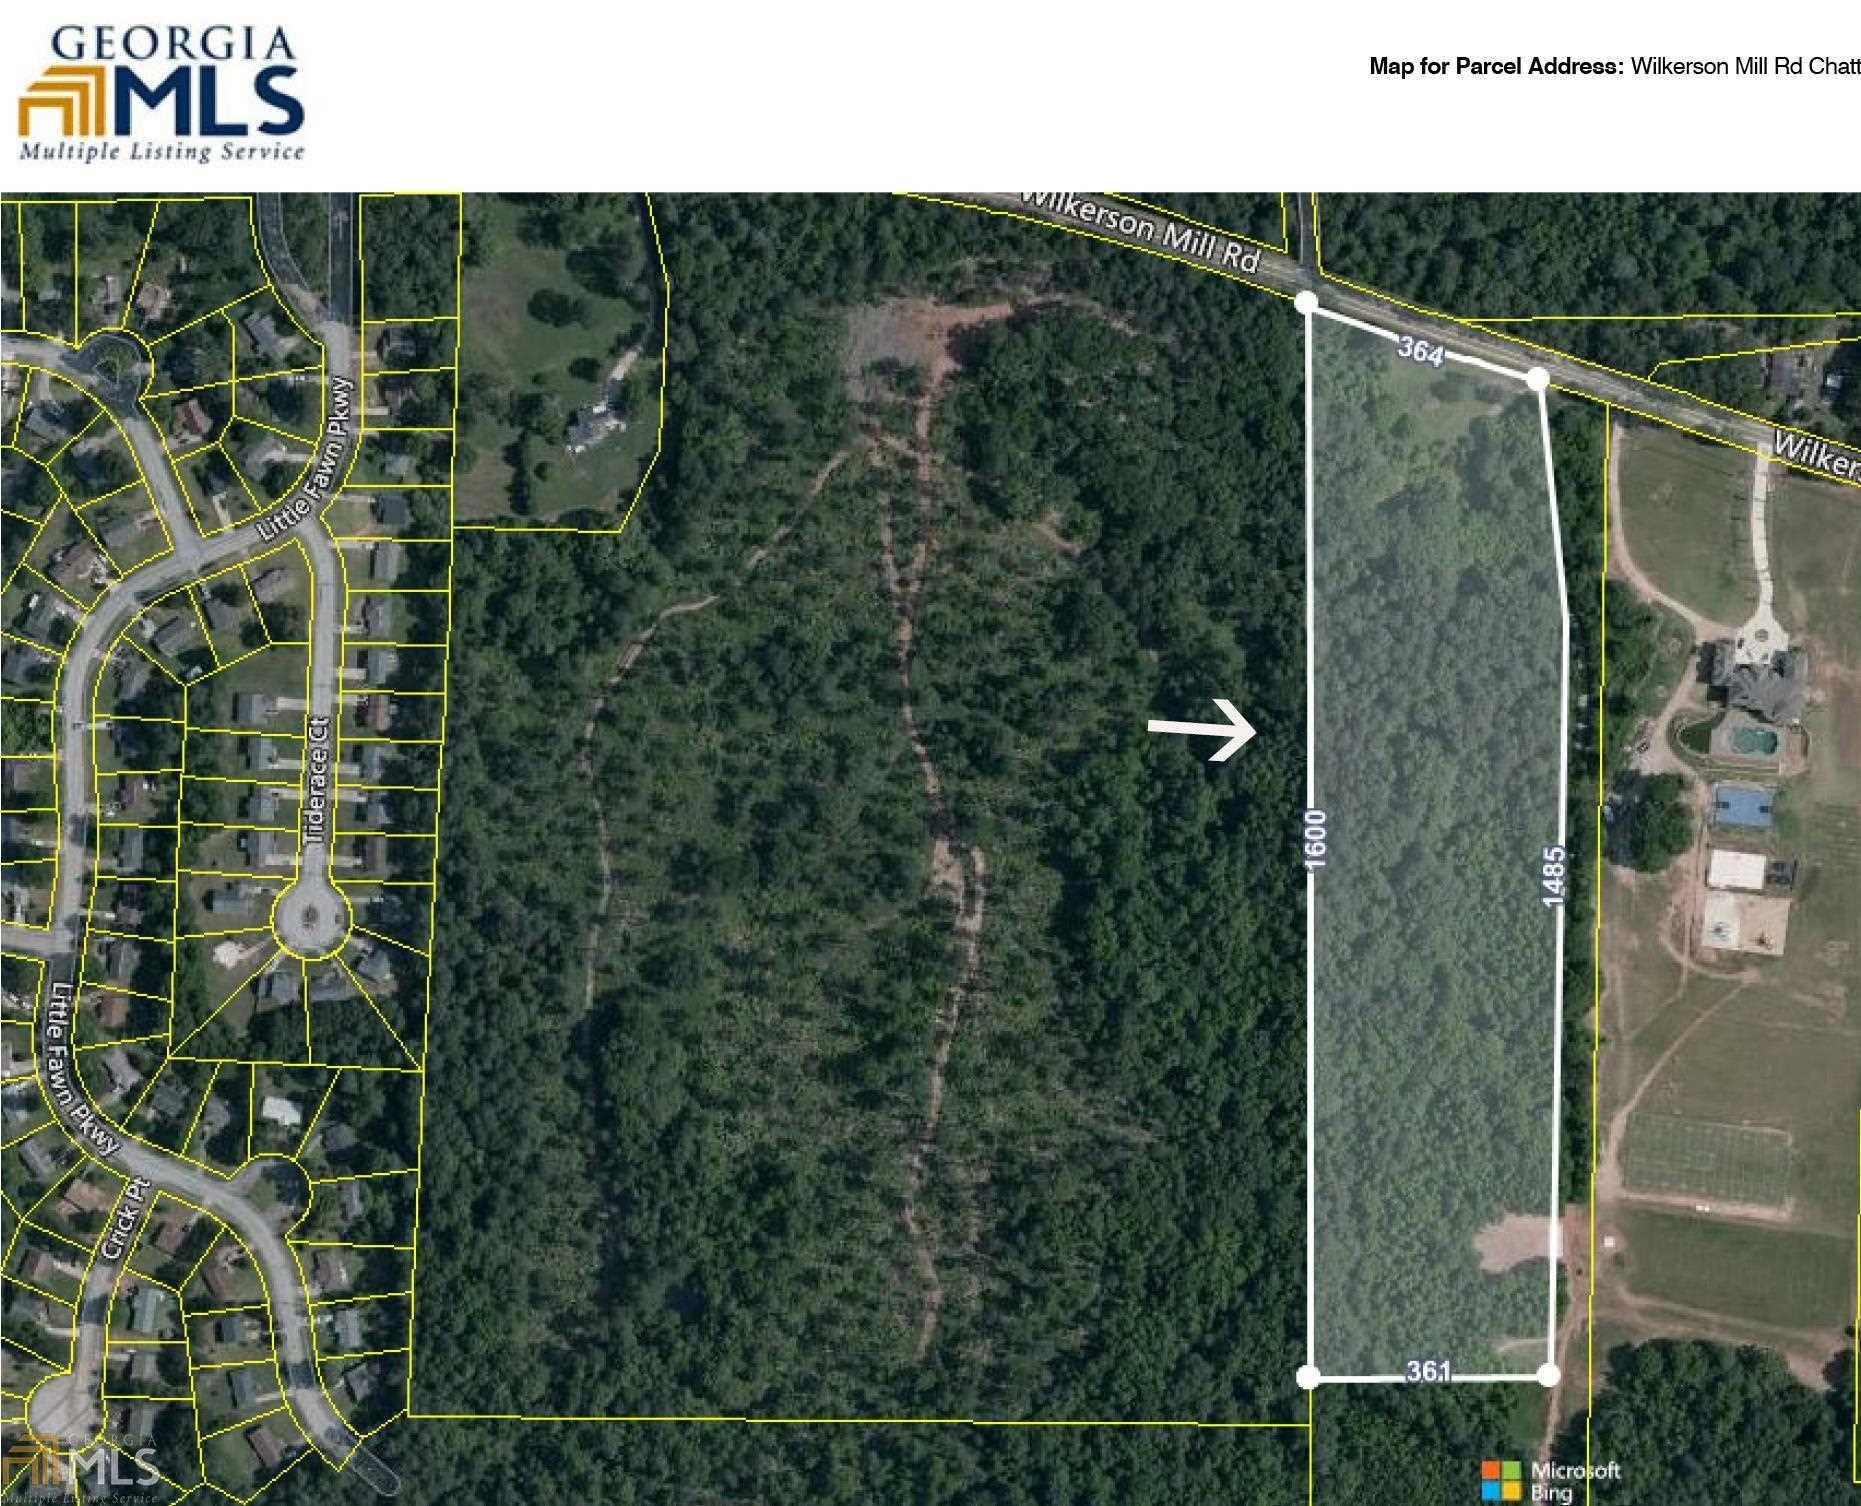 0 Wilkerson Mill Rd, Chattahoochee Hills, GA 30268 - #: 8928642